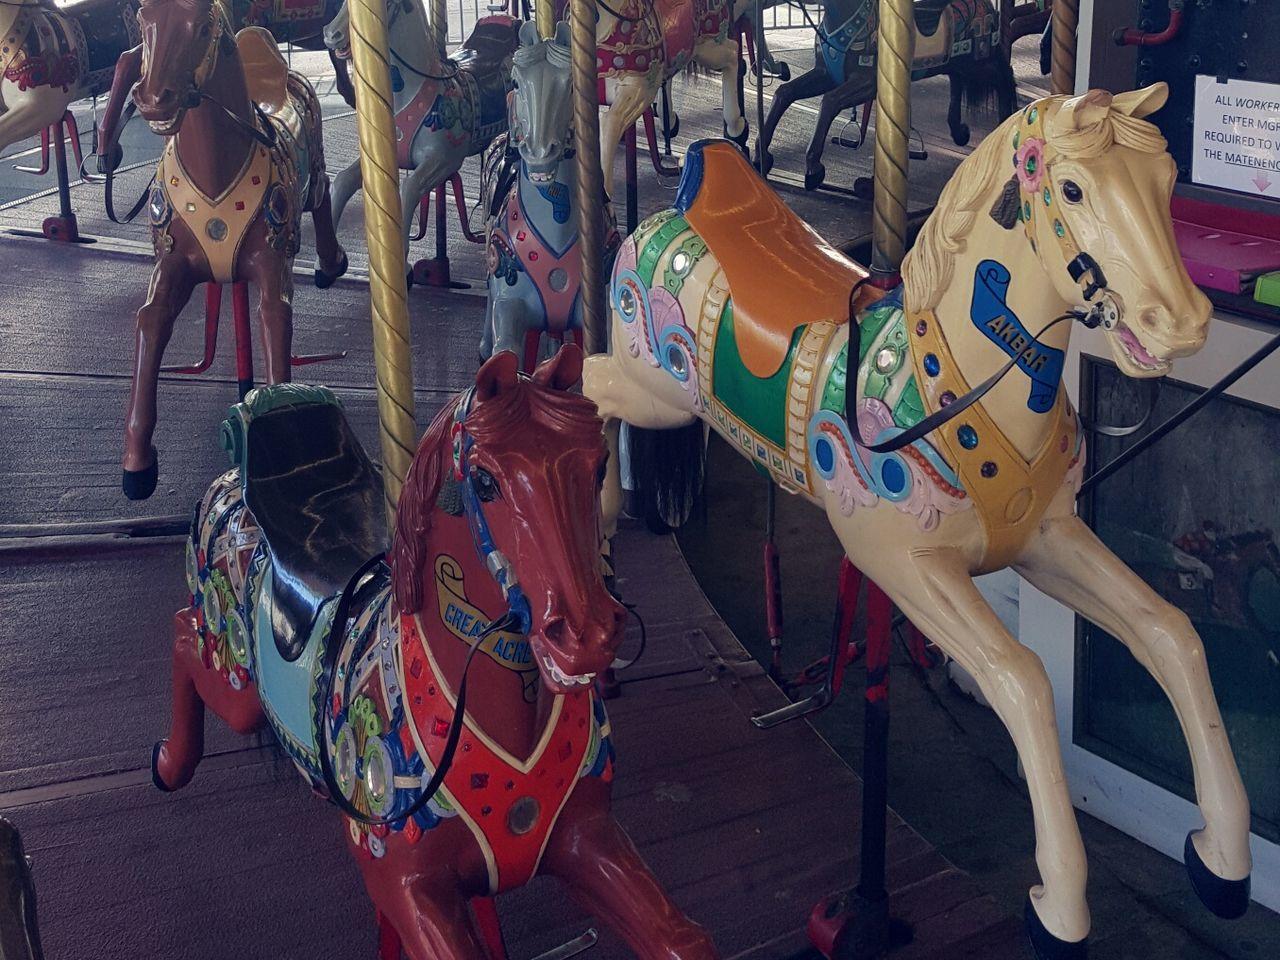 Carousel Horse Vintage Carousel Canberra City